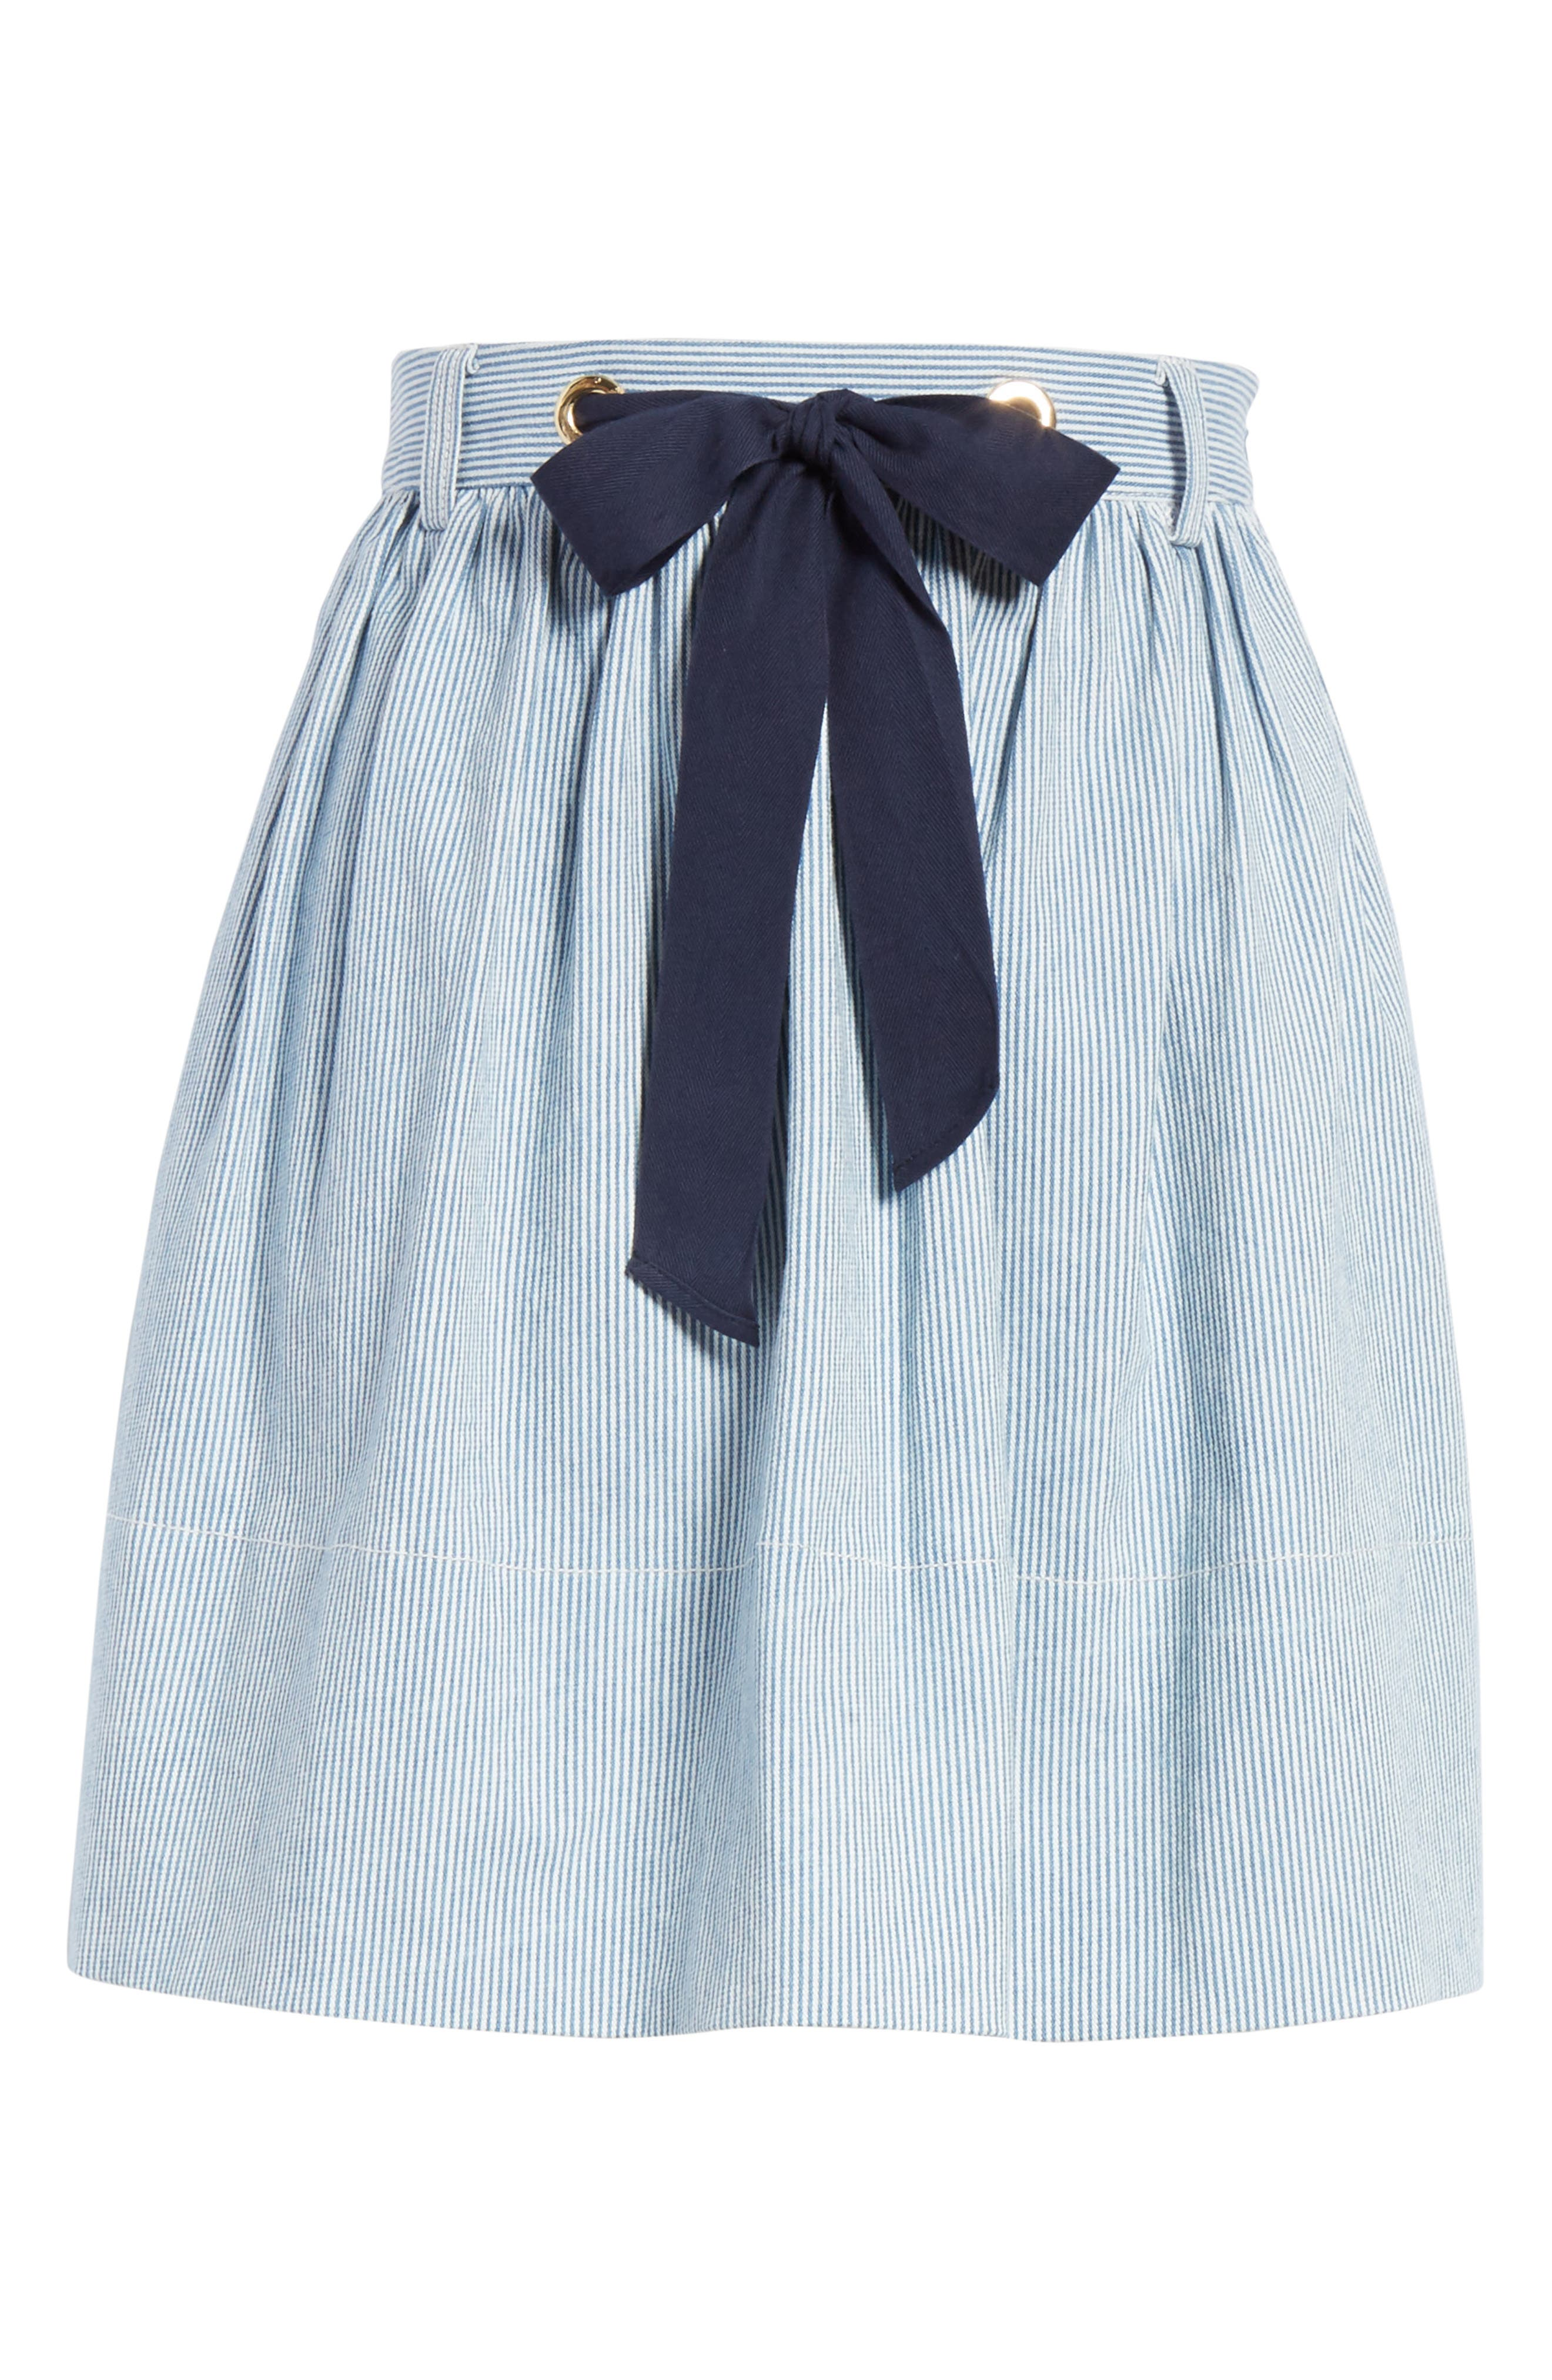 railroad stripe denim skirt,                             Alternate thumbnail 6, color,                             Indigo/ Cream